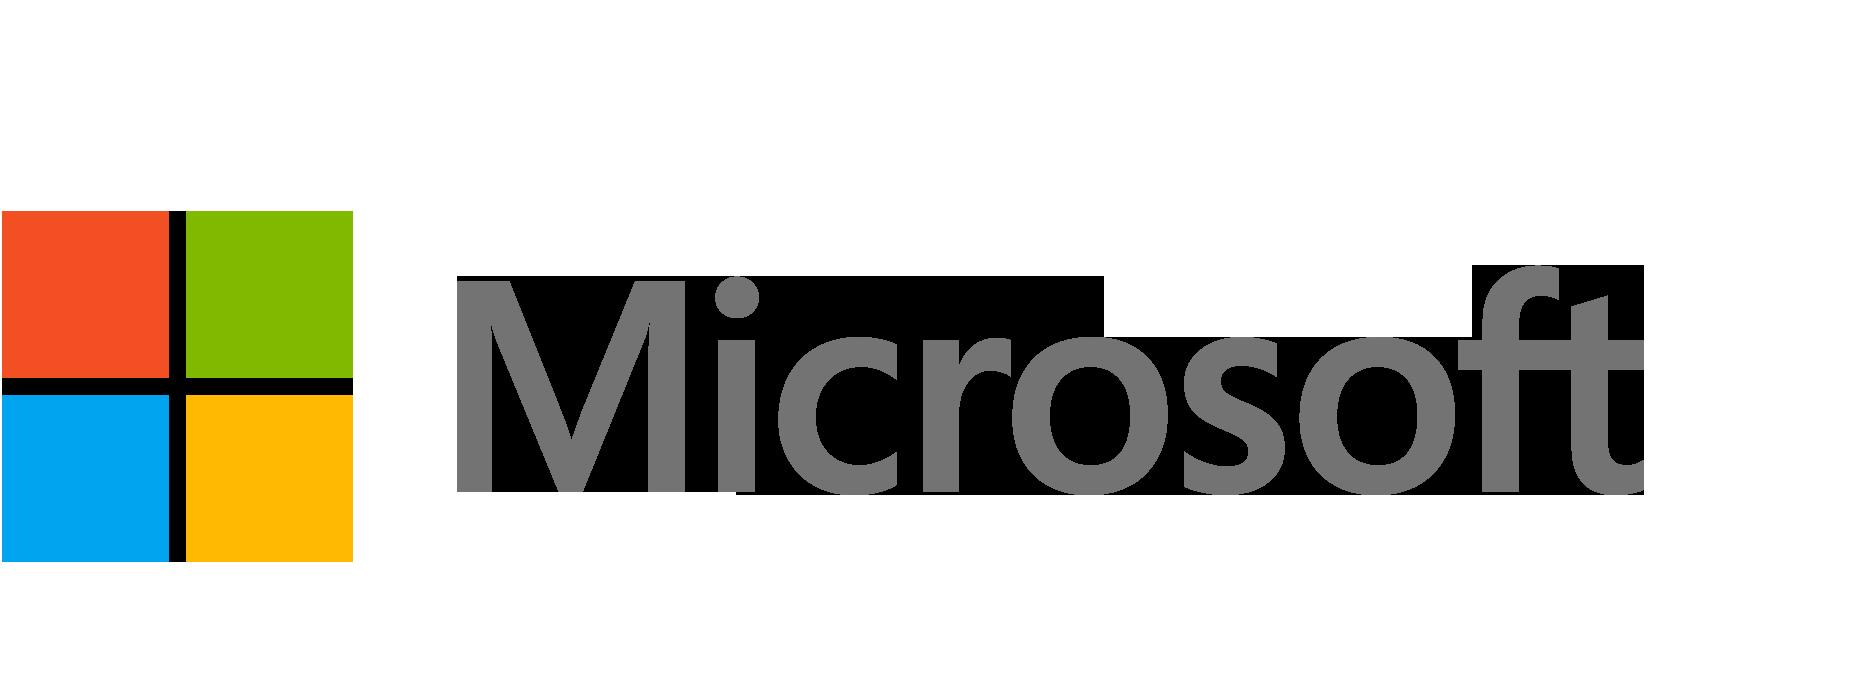 microsoft_PNG4.png